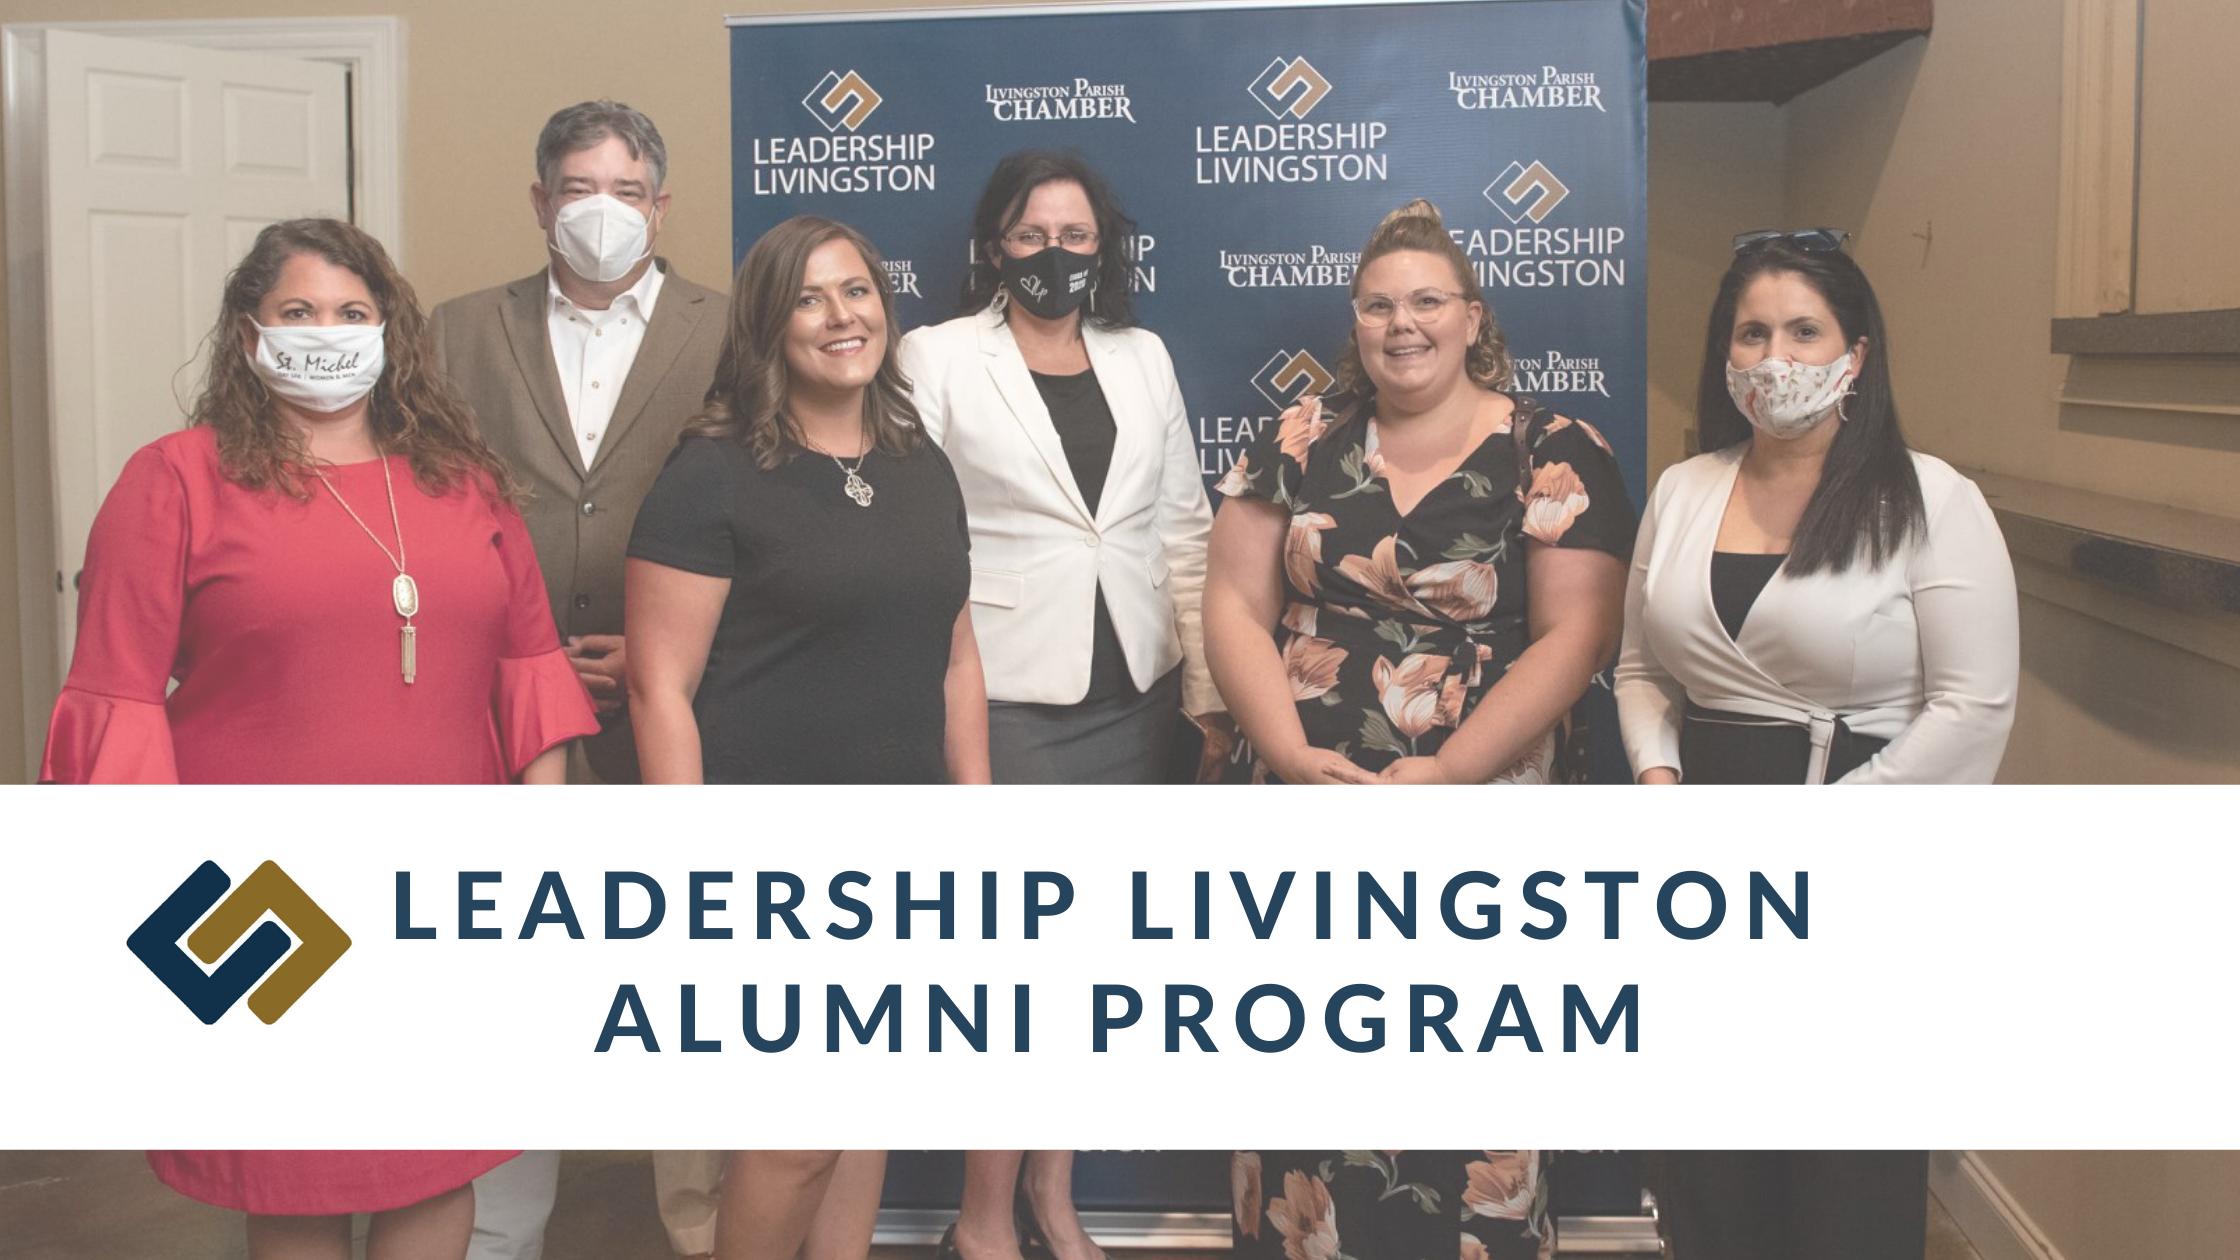 Leders;hip Alumni Program